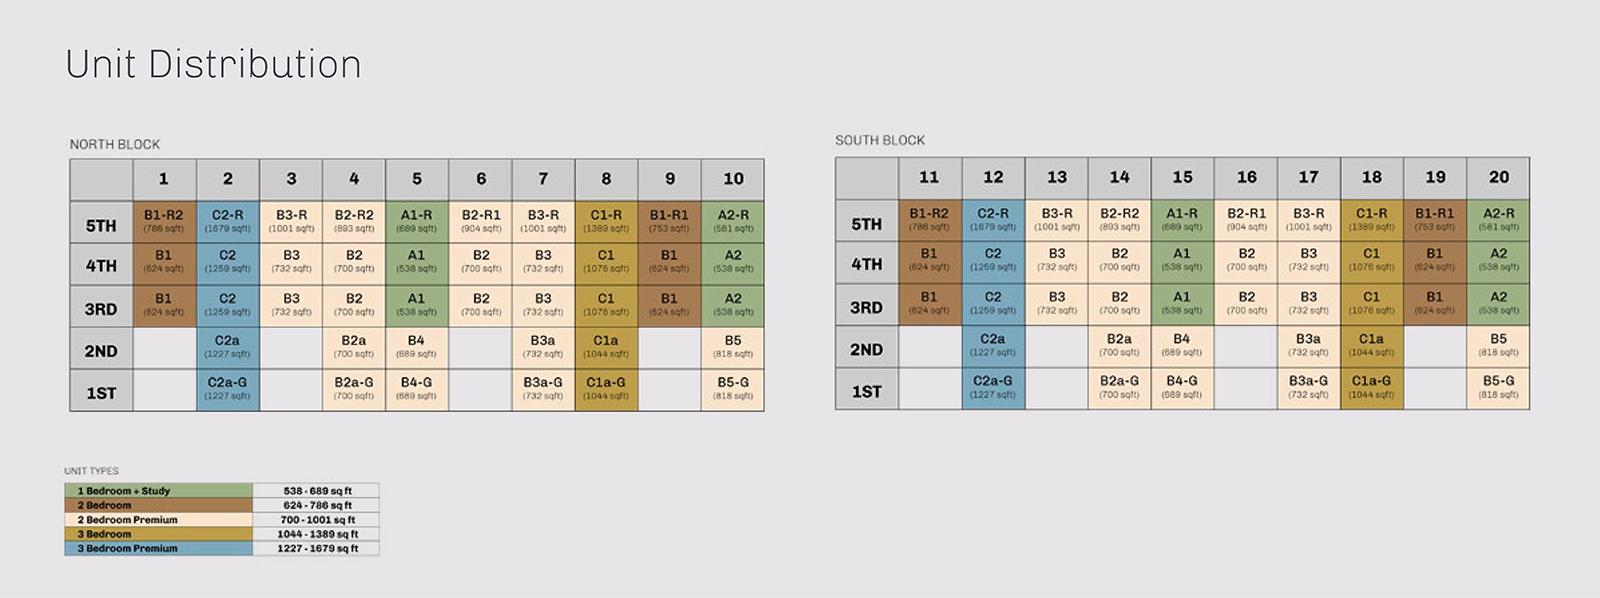 new-condo-singapore-the-essence-unit-distribution-chart